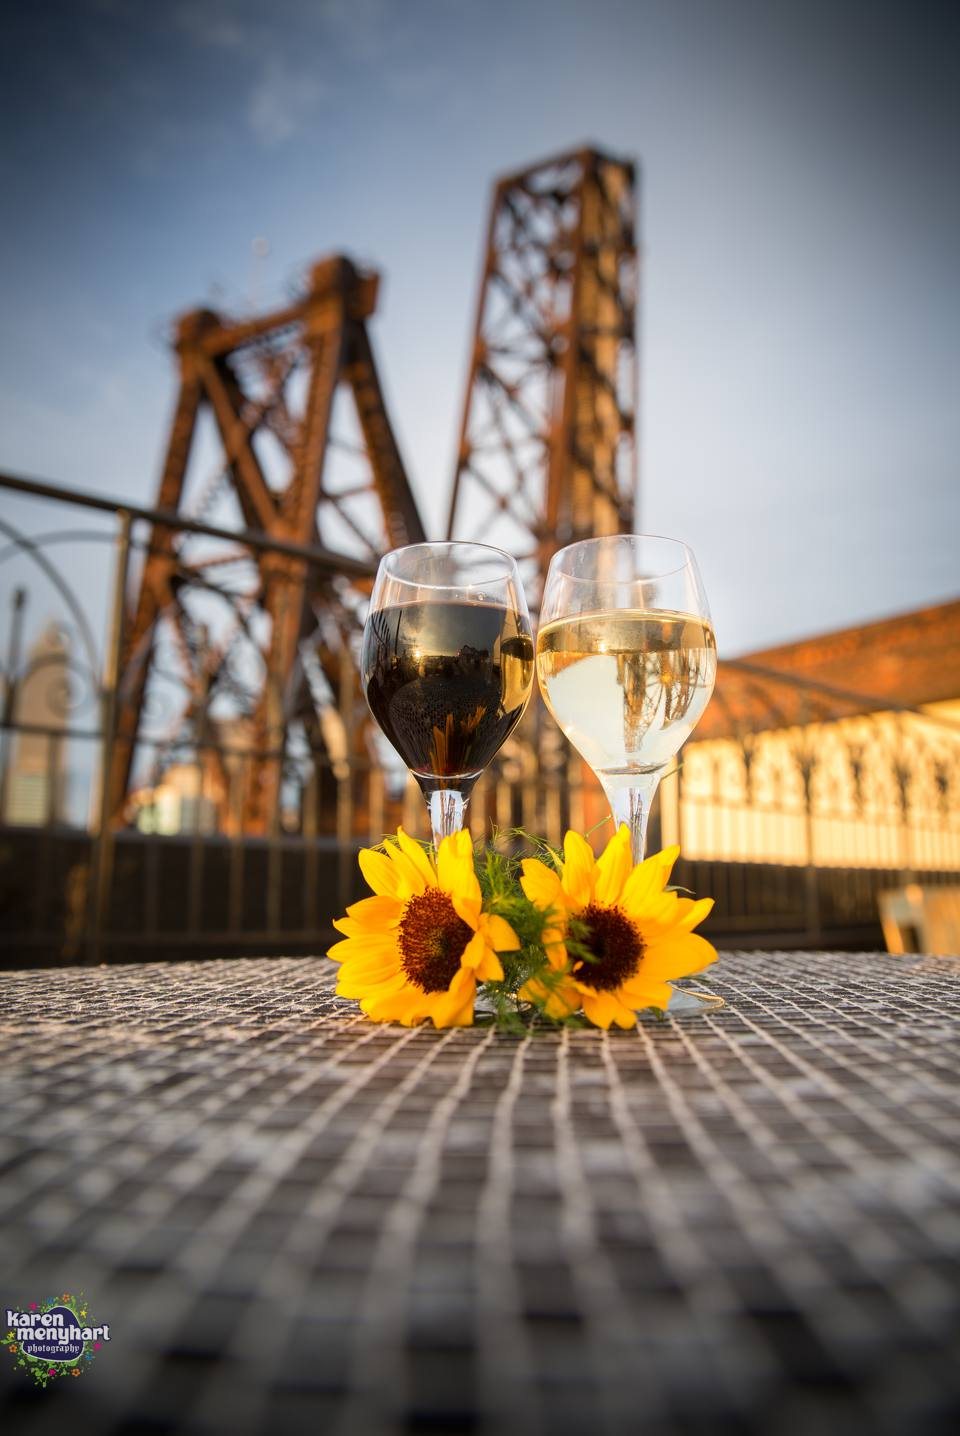 karen menyhart photography, prayers from maria sunflower soiree, cleveland photographer